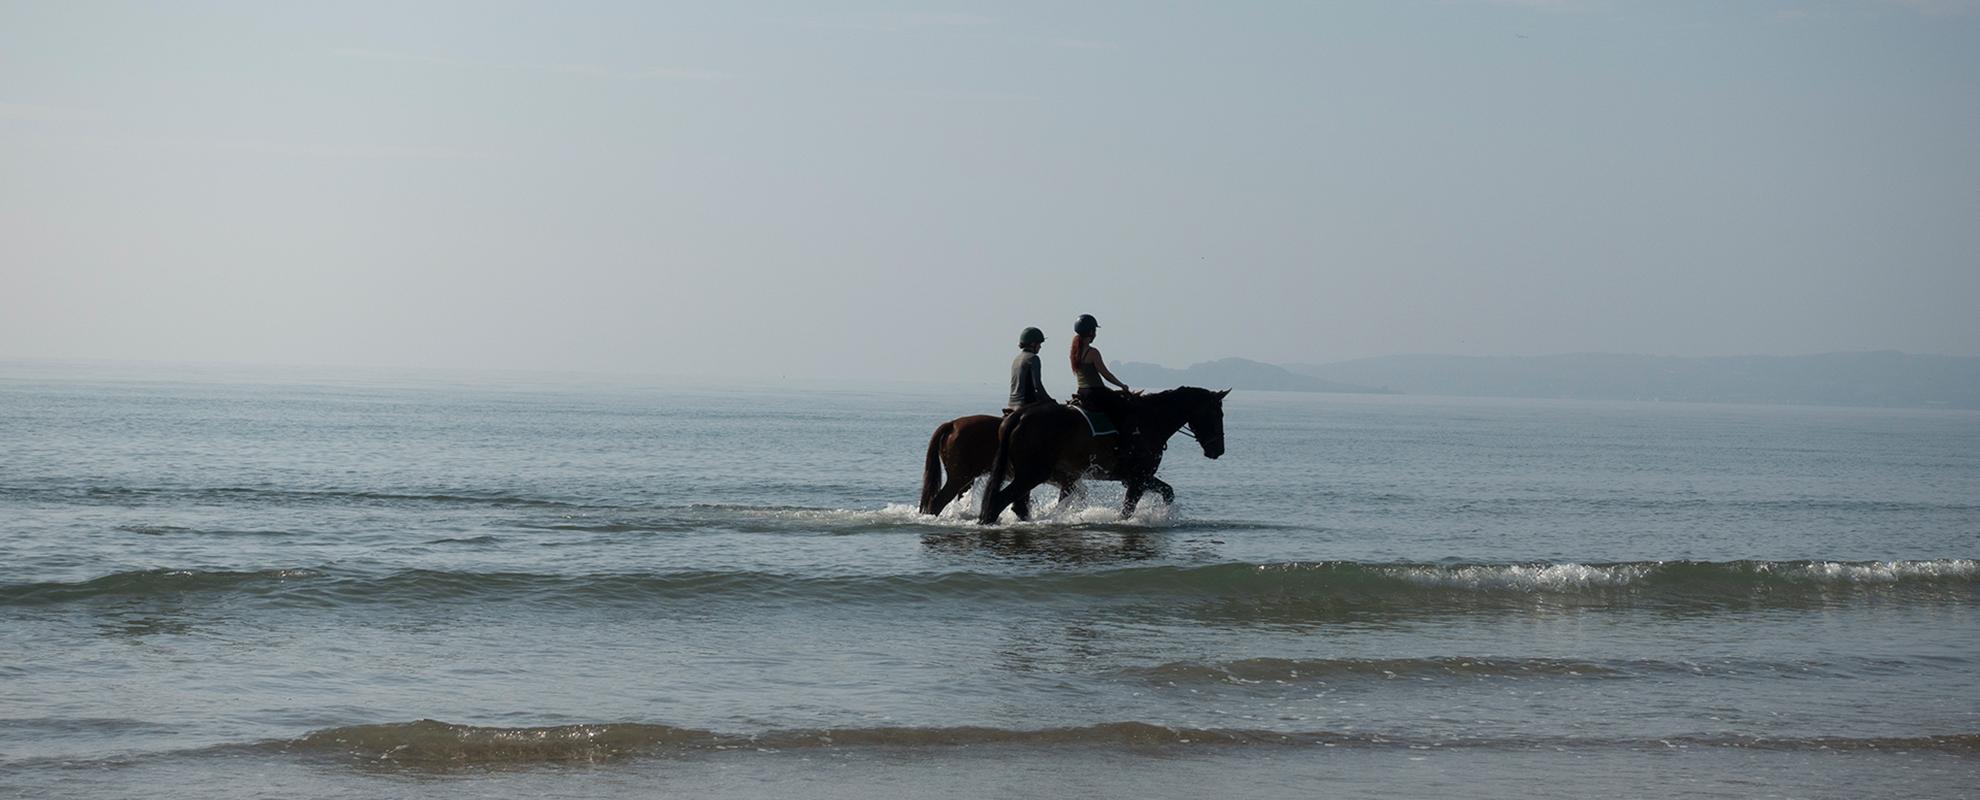 horses on the sunny morning beach